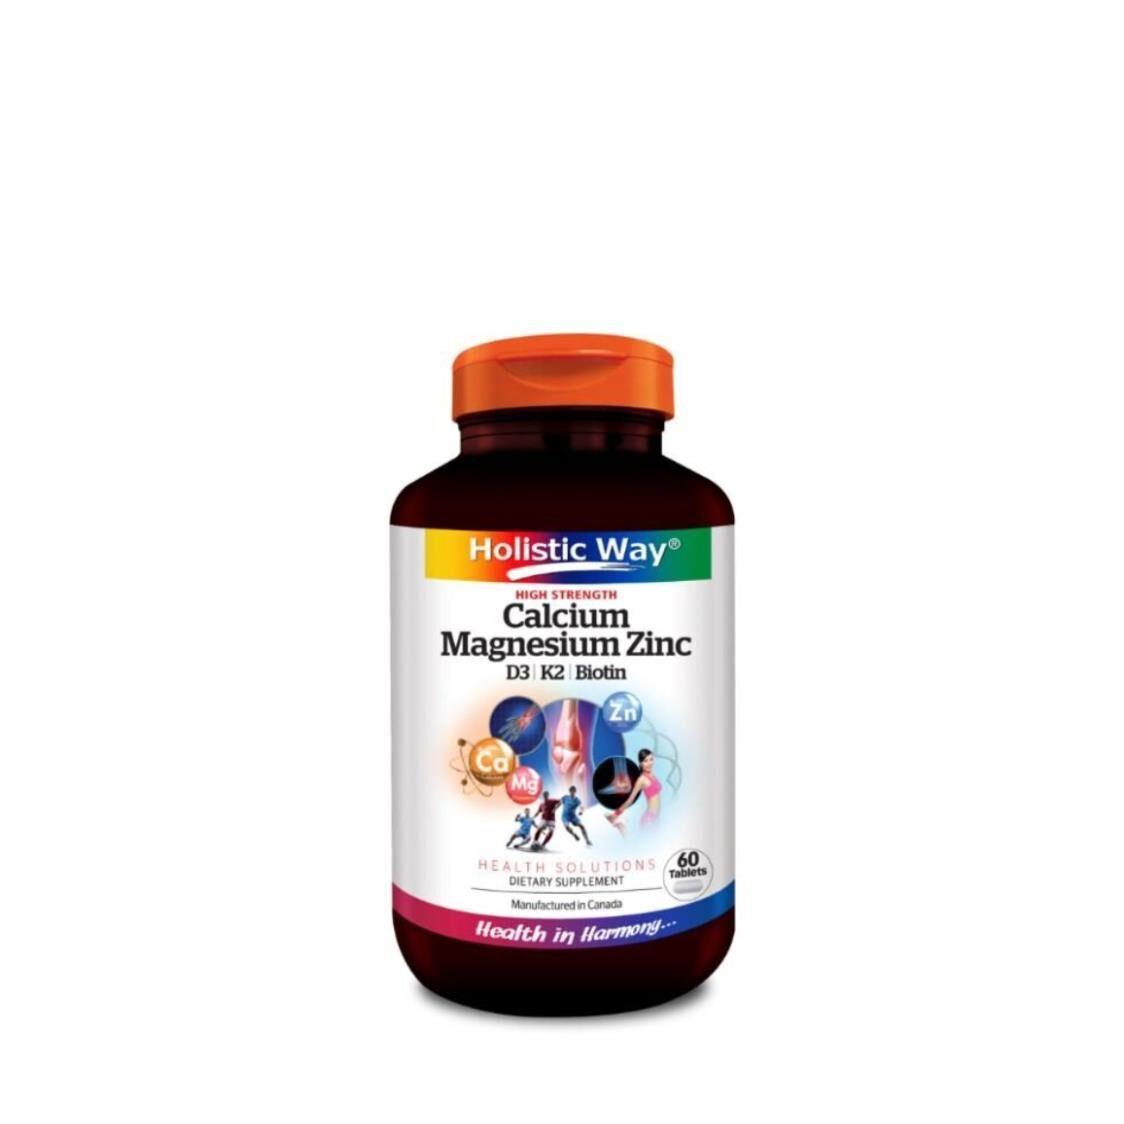 Holistic Way High Strength Calcium Magnesium Zinc 60s